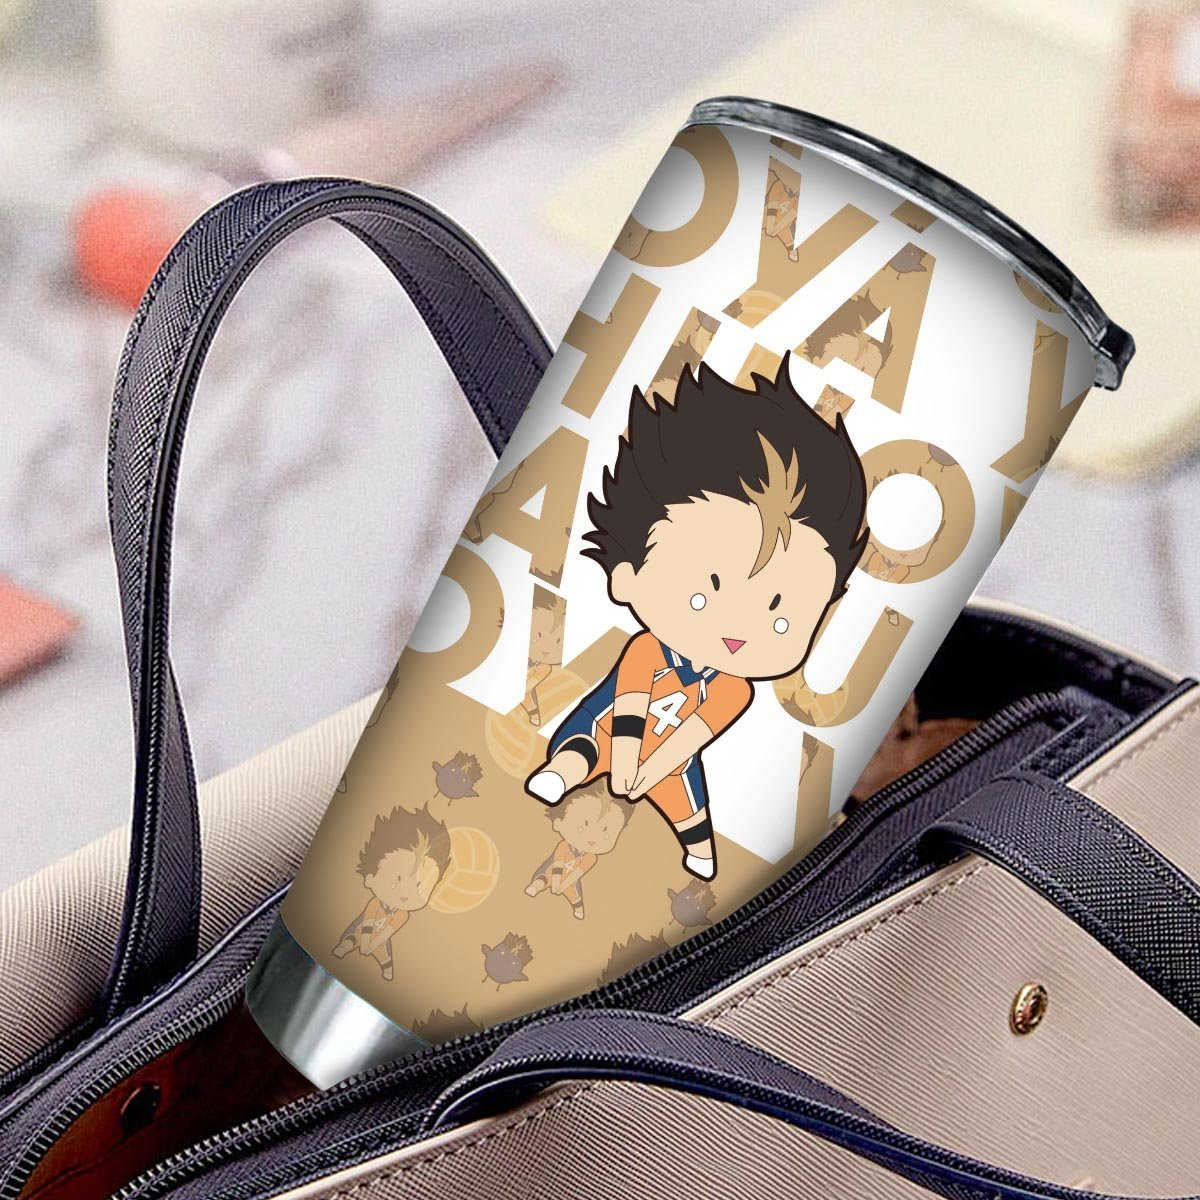 personalized chibi nishinoya tumbler 446326 - Otaku Treat